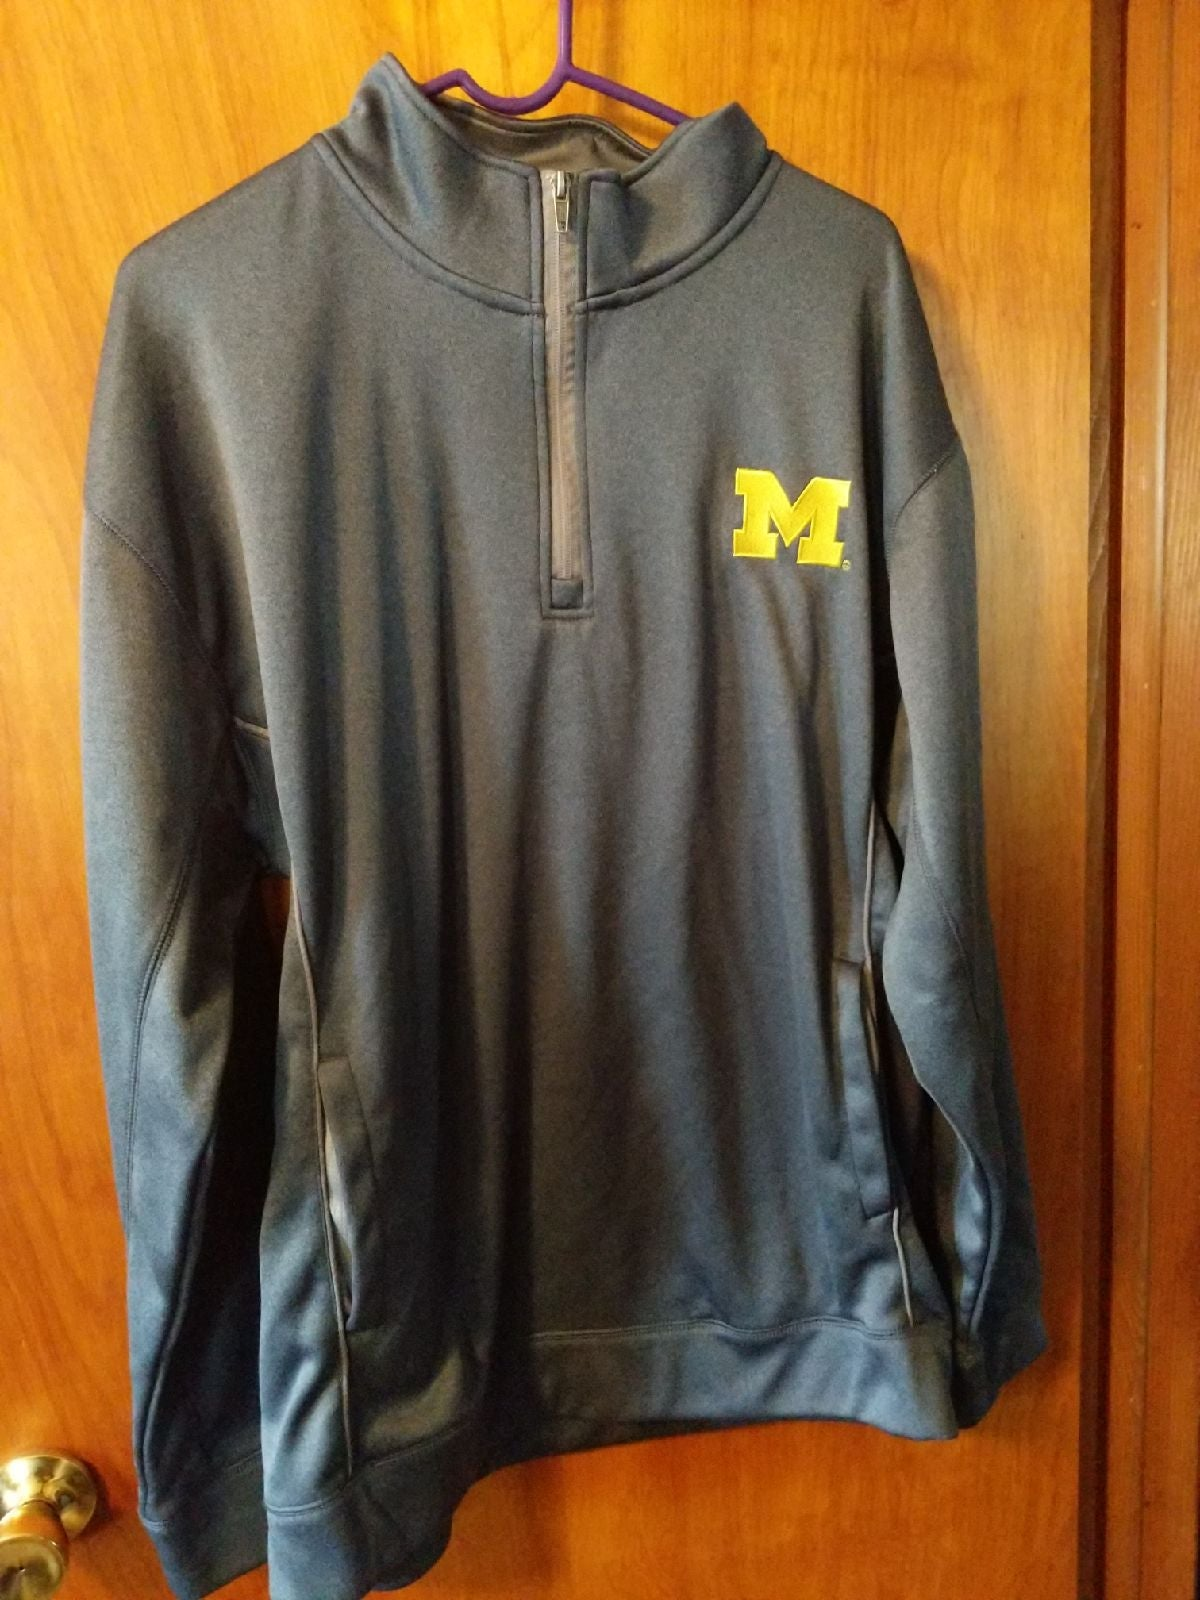 Mens Michigan Pullover sweater size 2x